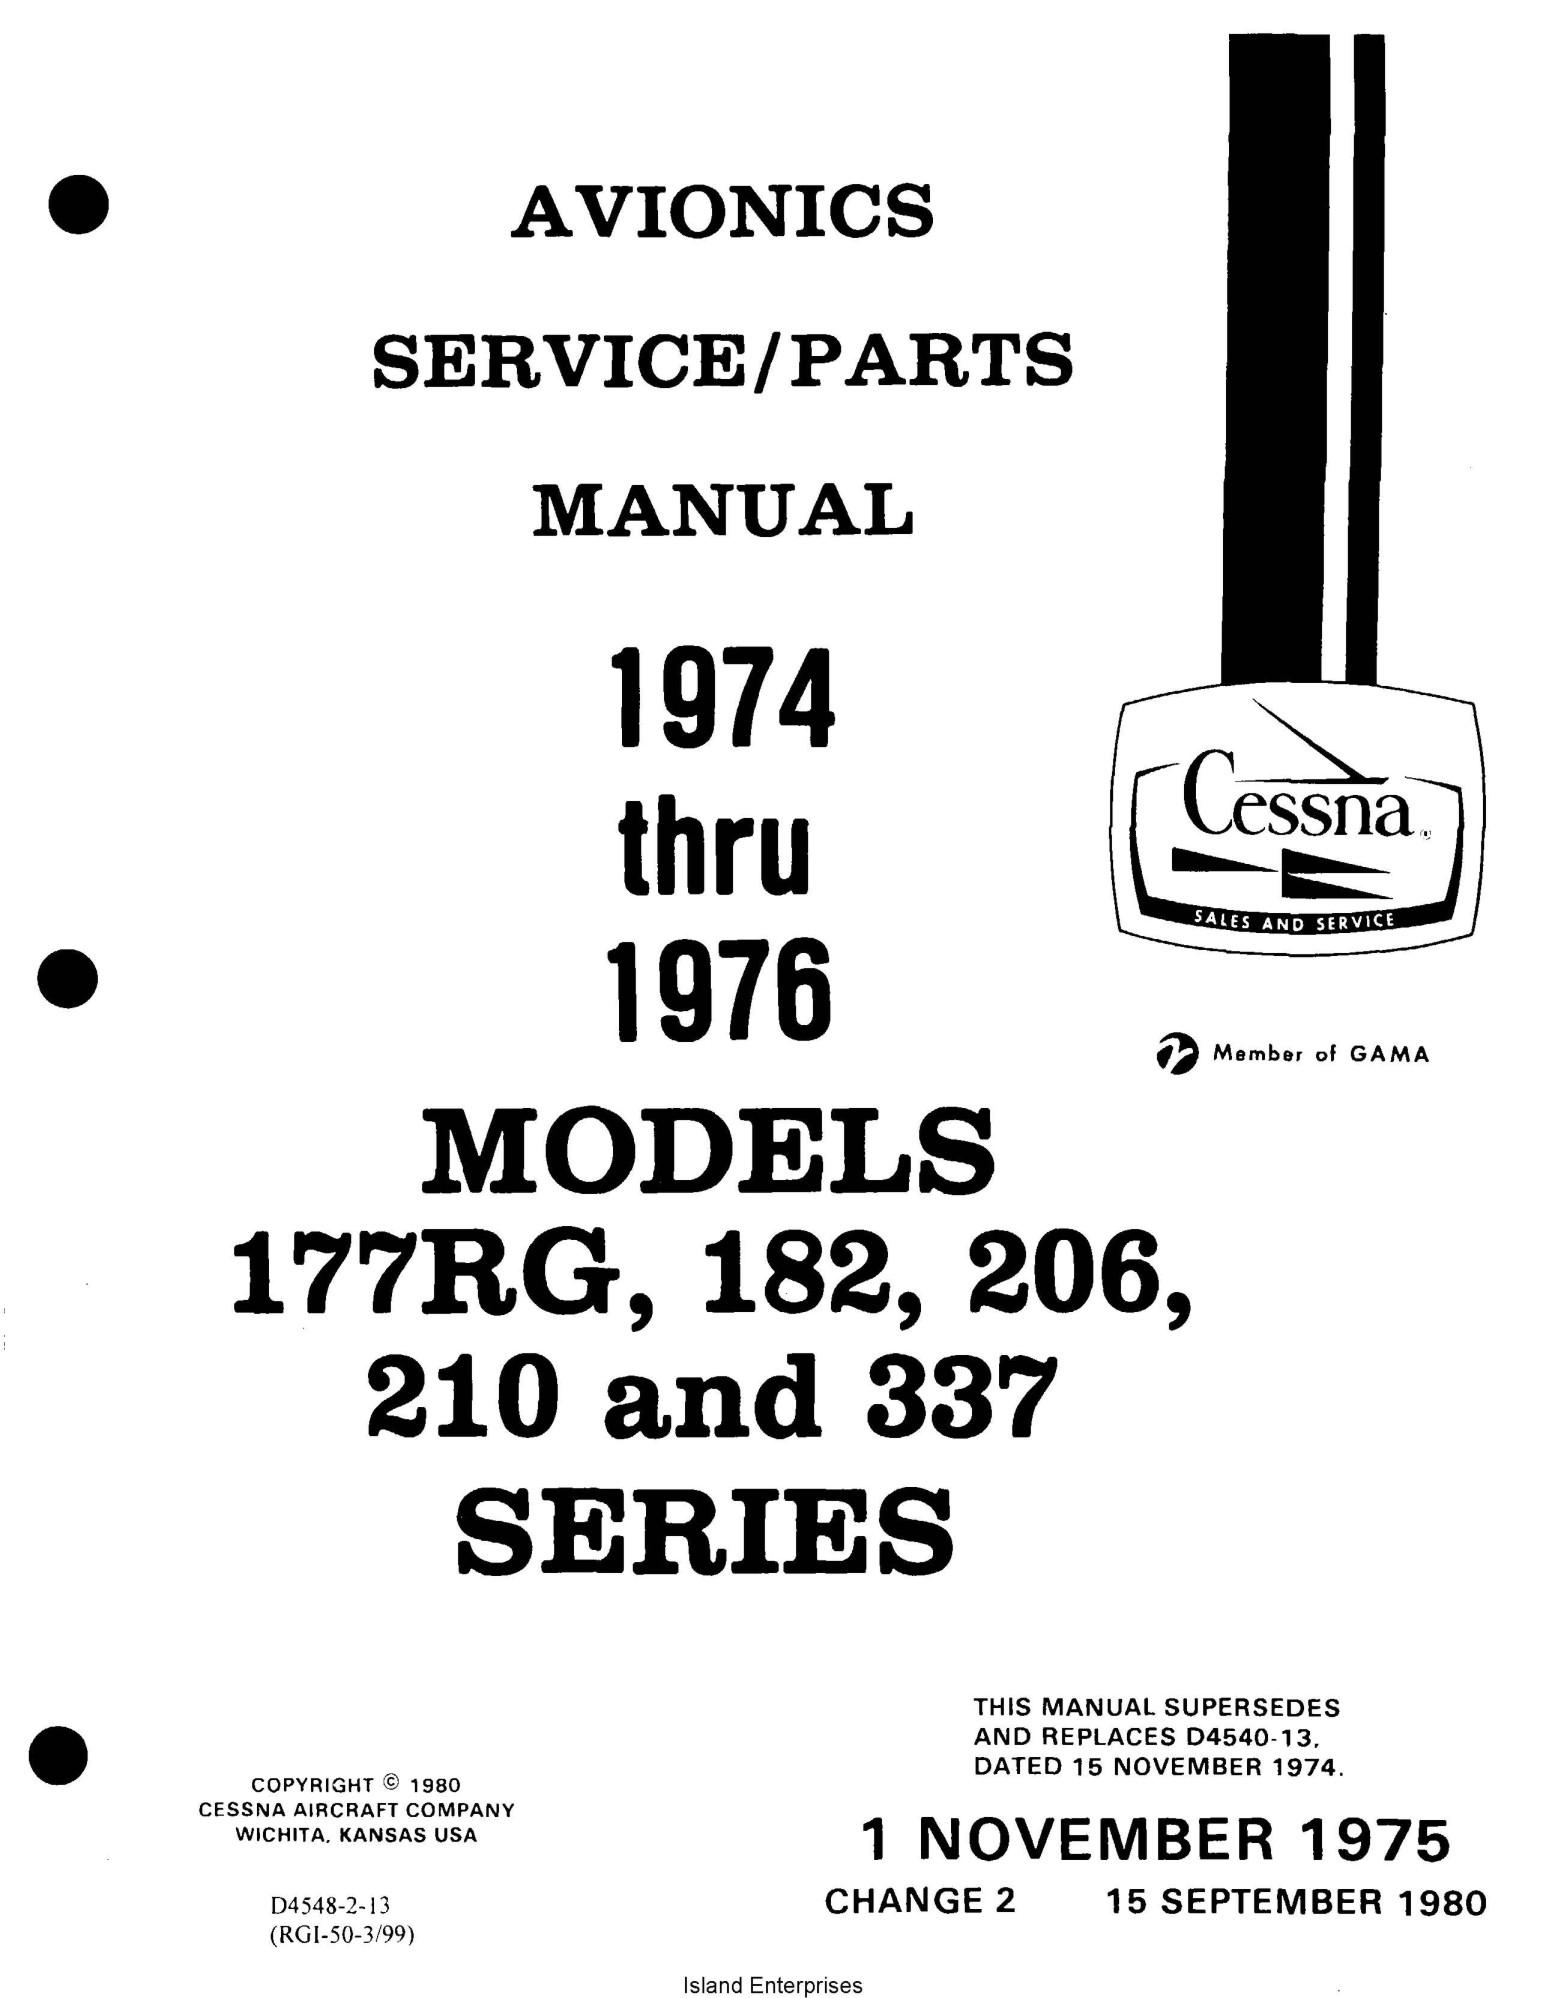 Cessna Models 177 RG, 182, 206, 210 and 337 series (1974